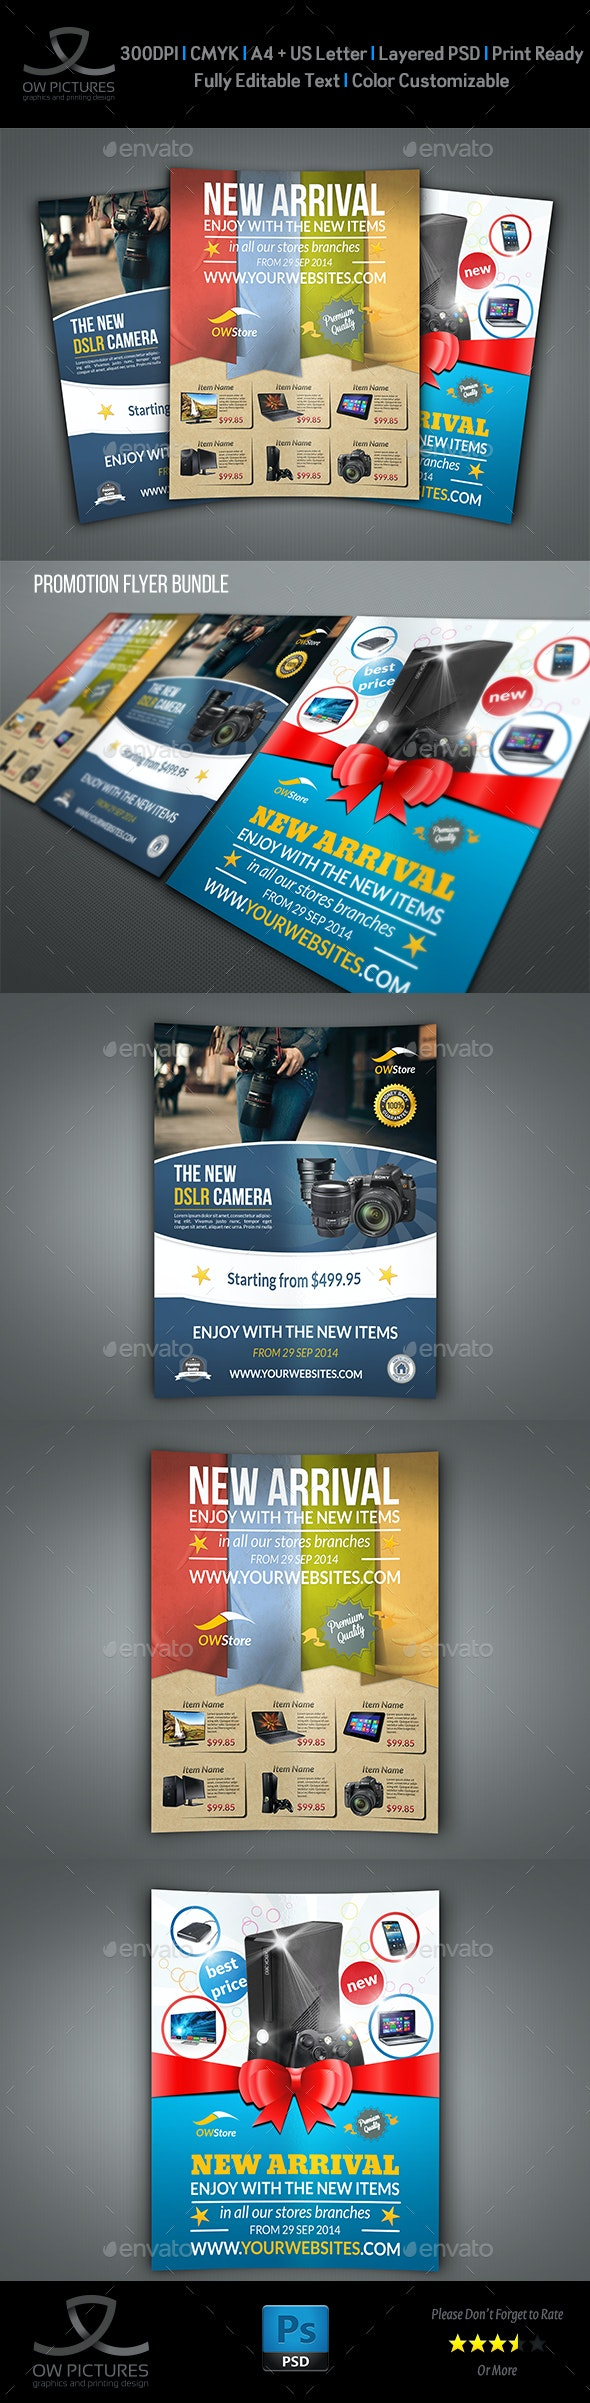 New Arrival Flyer Bundle Template - Commerce Flyers